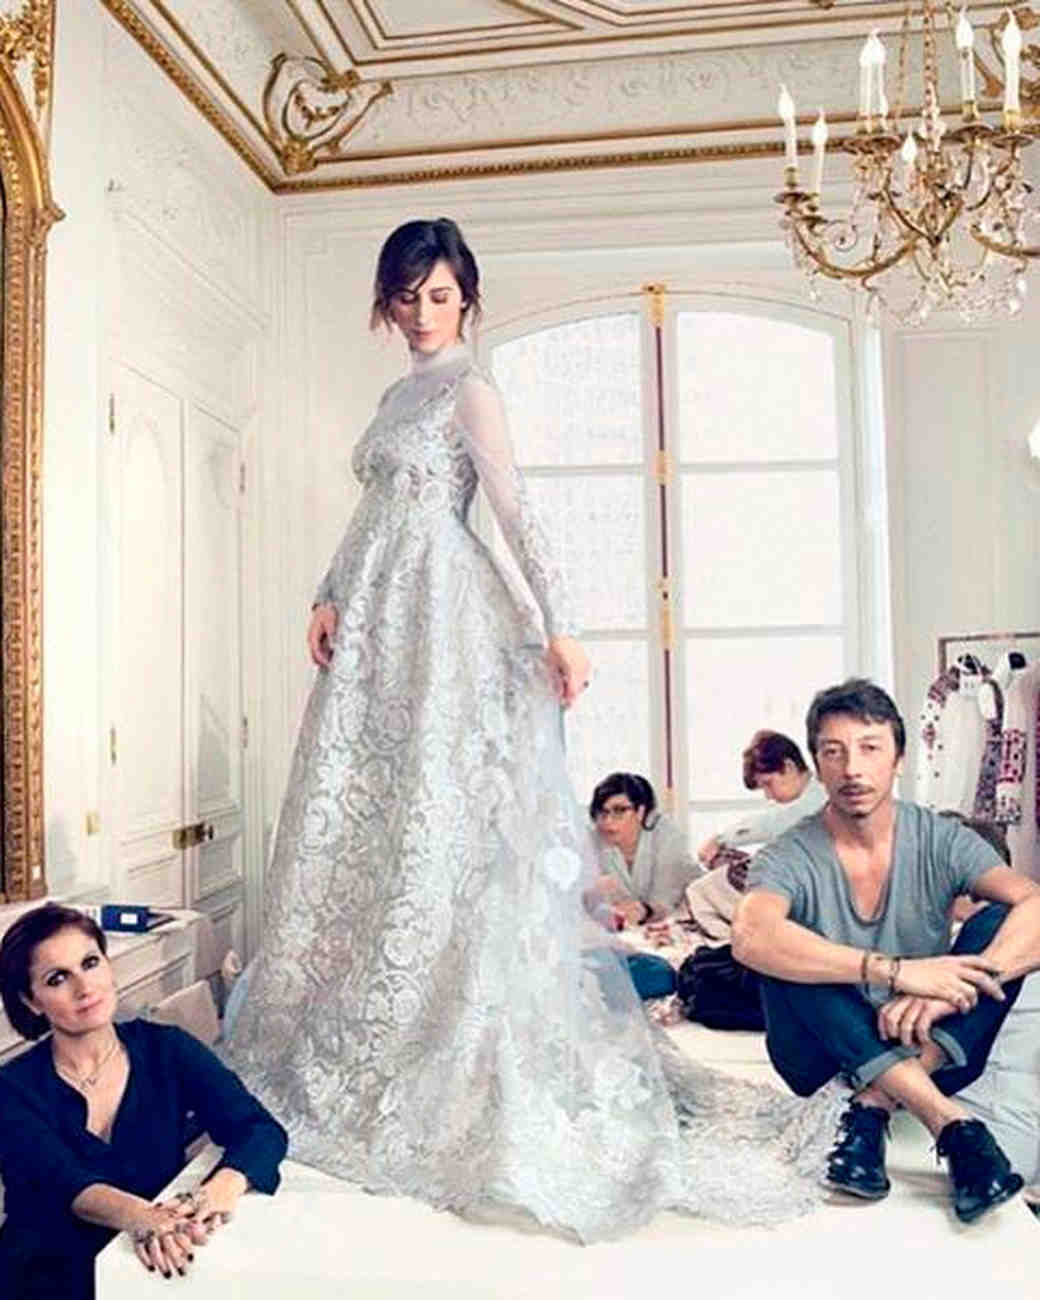 celebrity-colorful-wedding-dresses-sophie-hunter-gray-0815.jpg